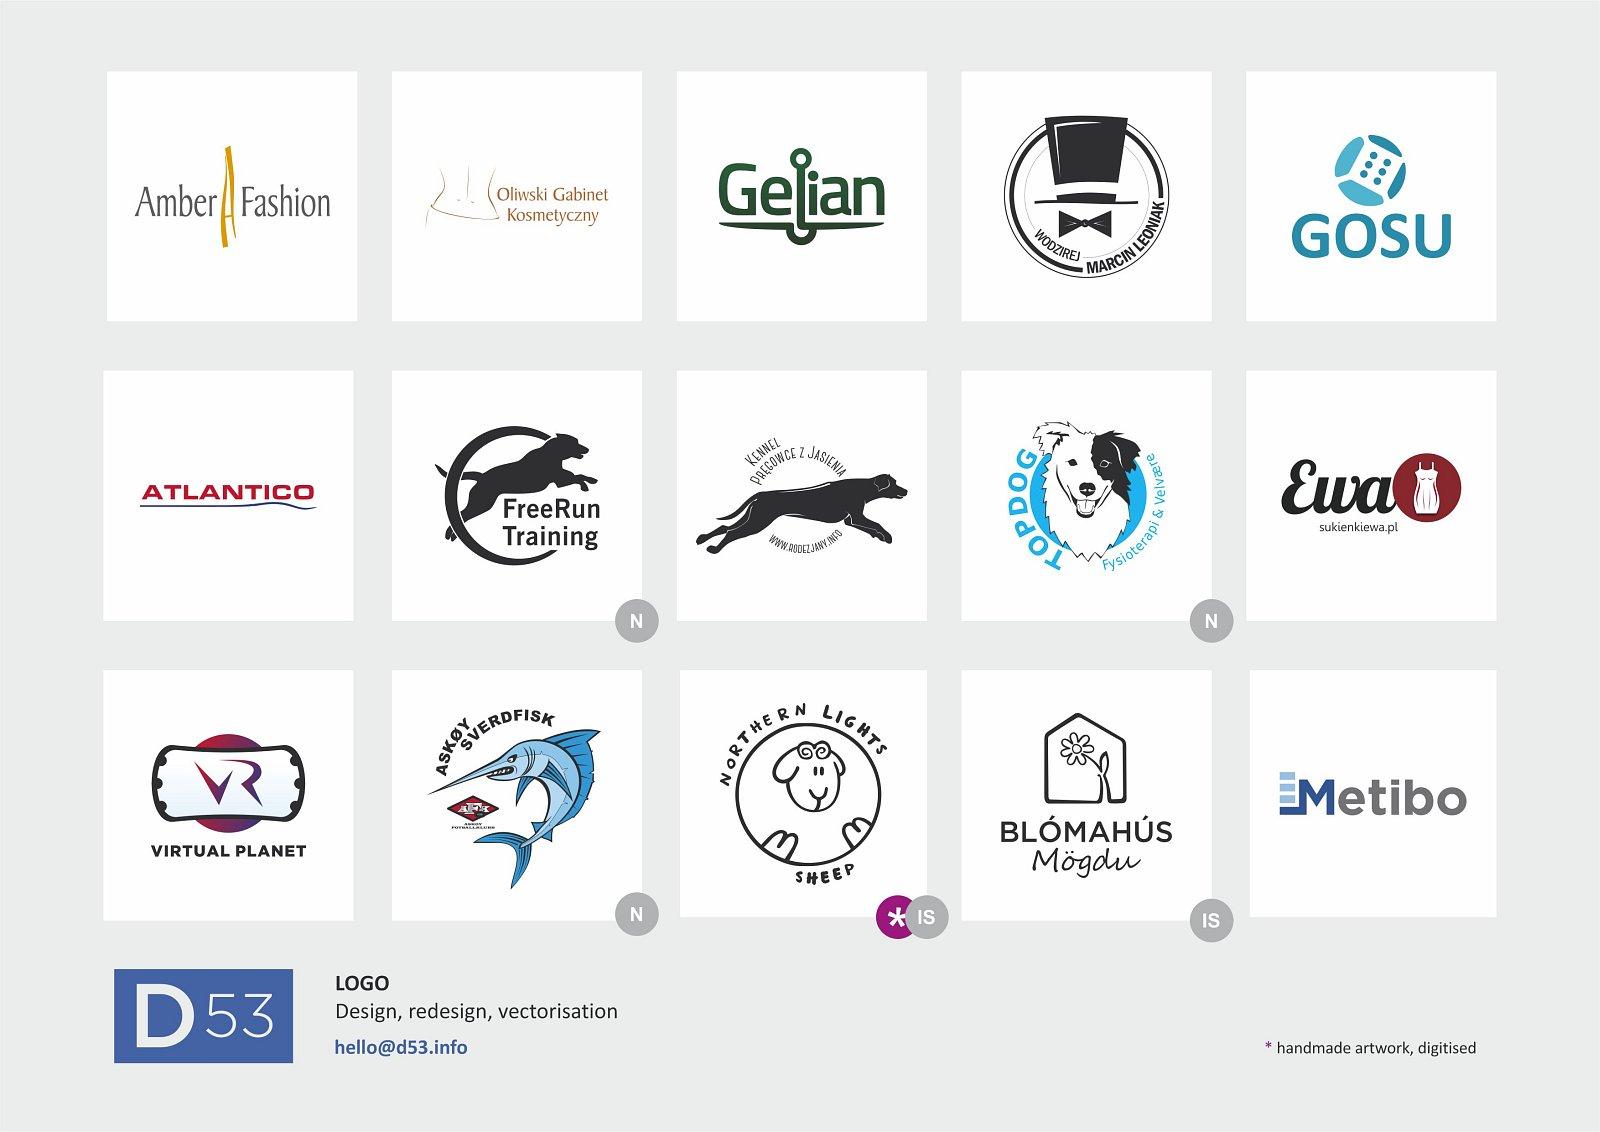 web_d53_promo-2020_logos